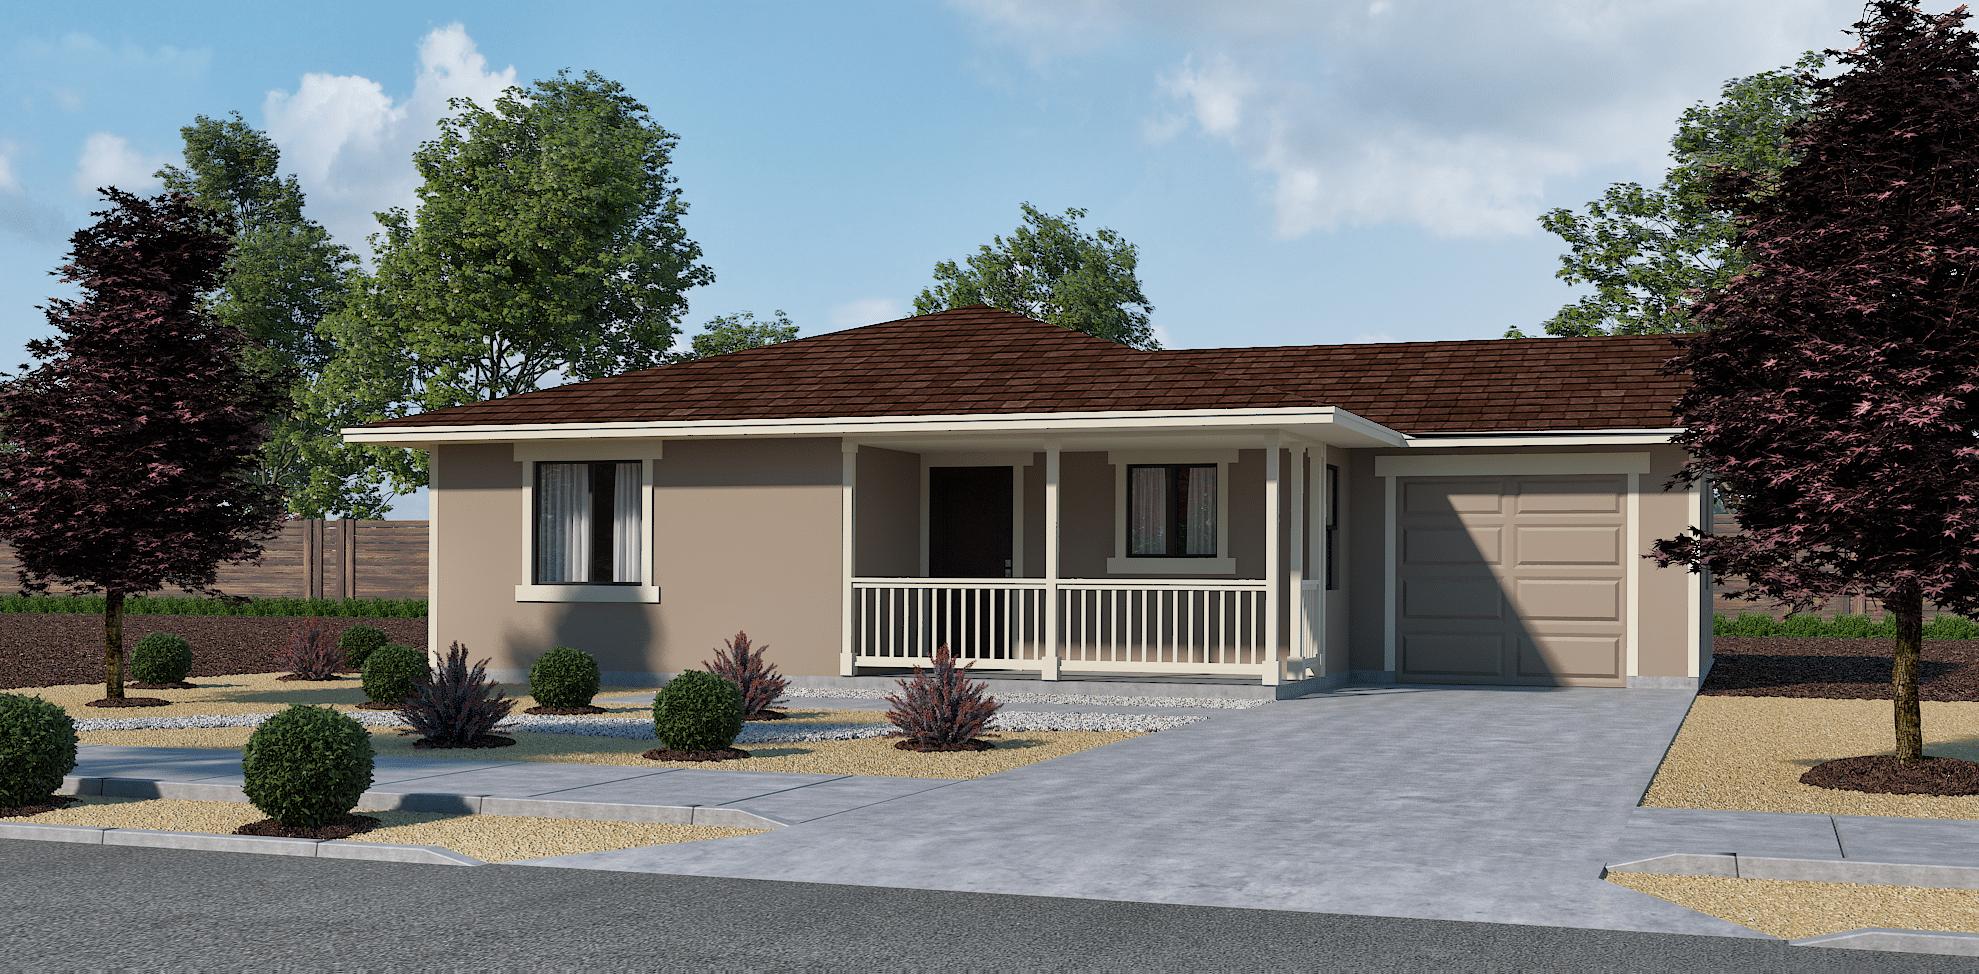 jenuane-communities-nv-flats-rendering-1